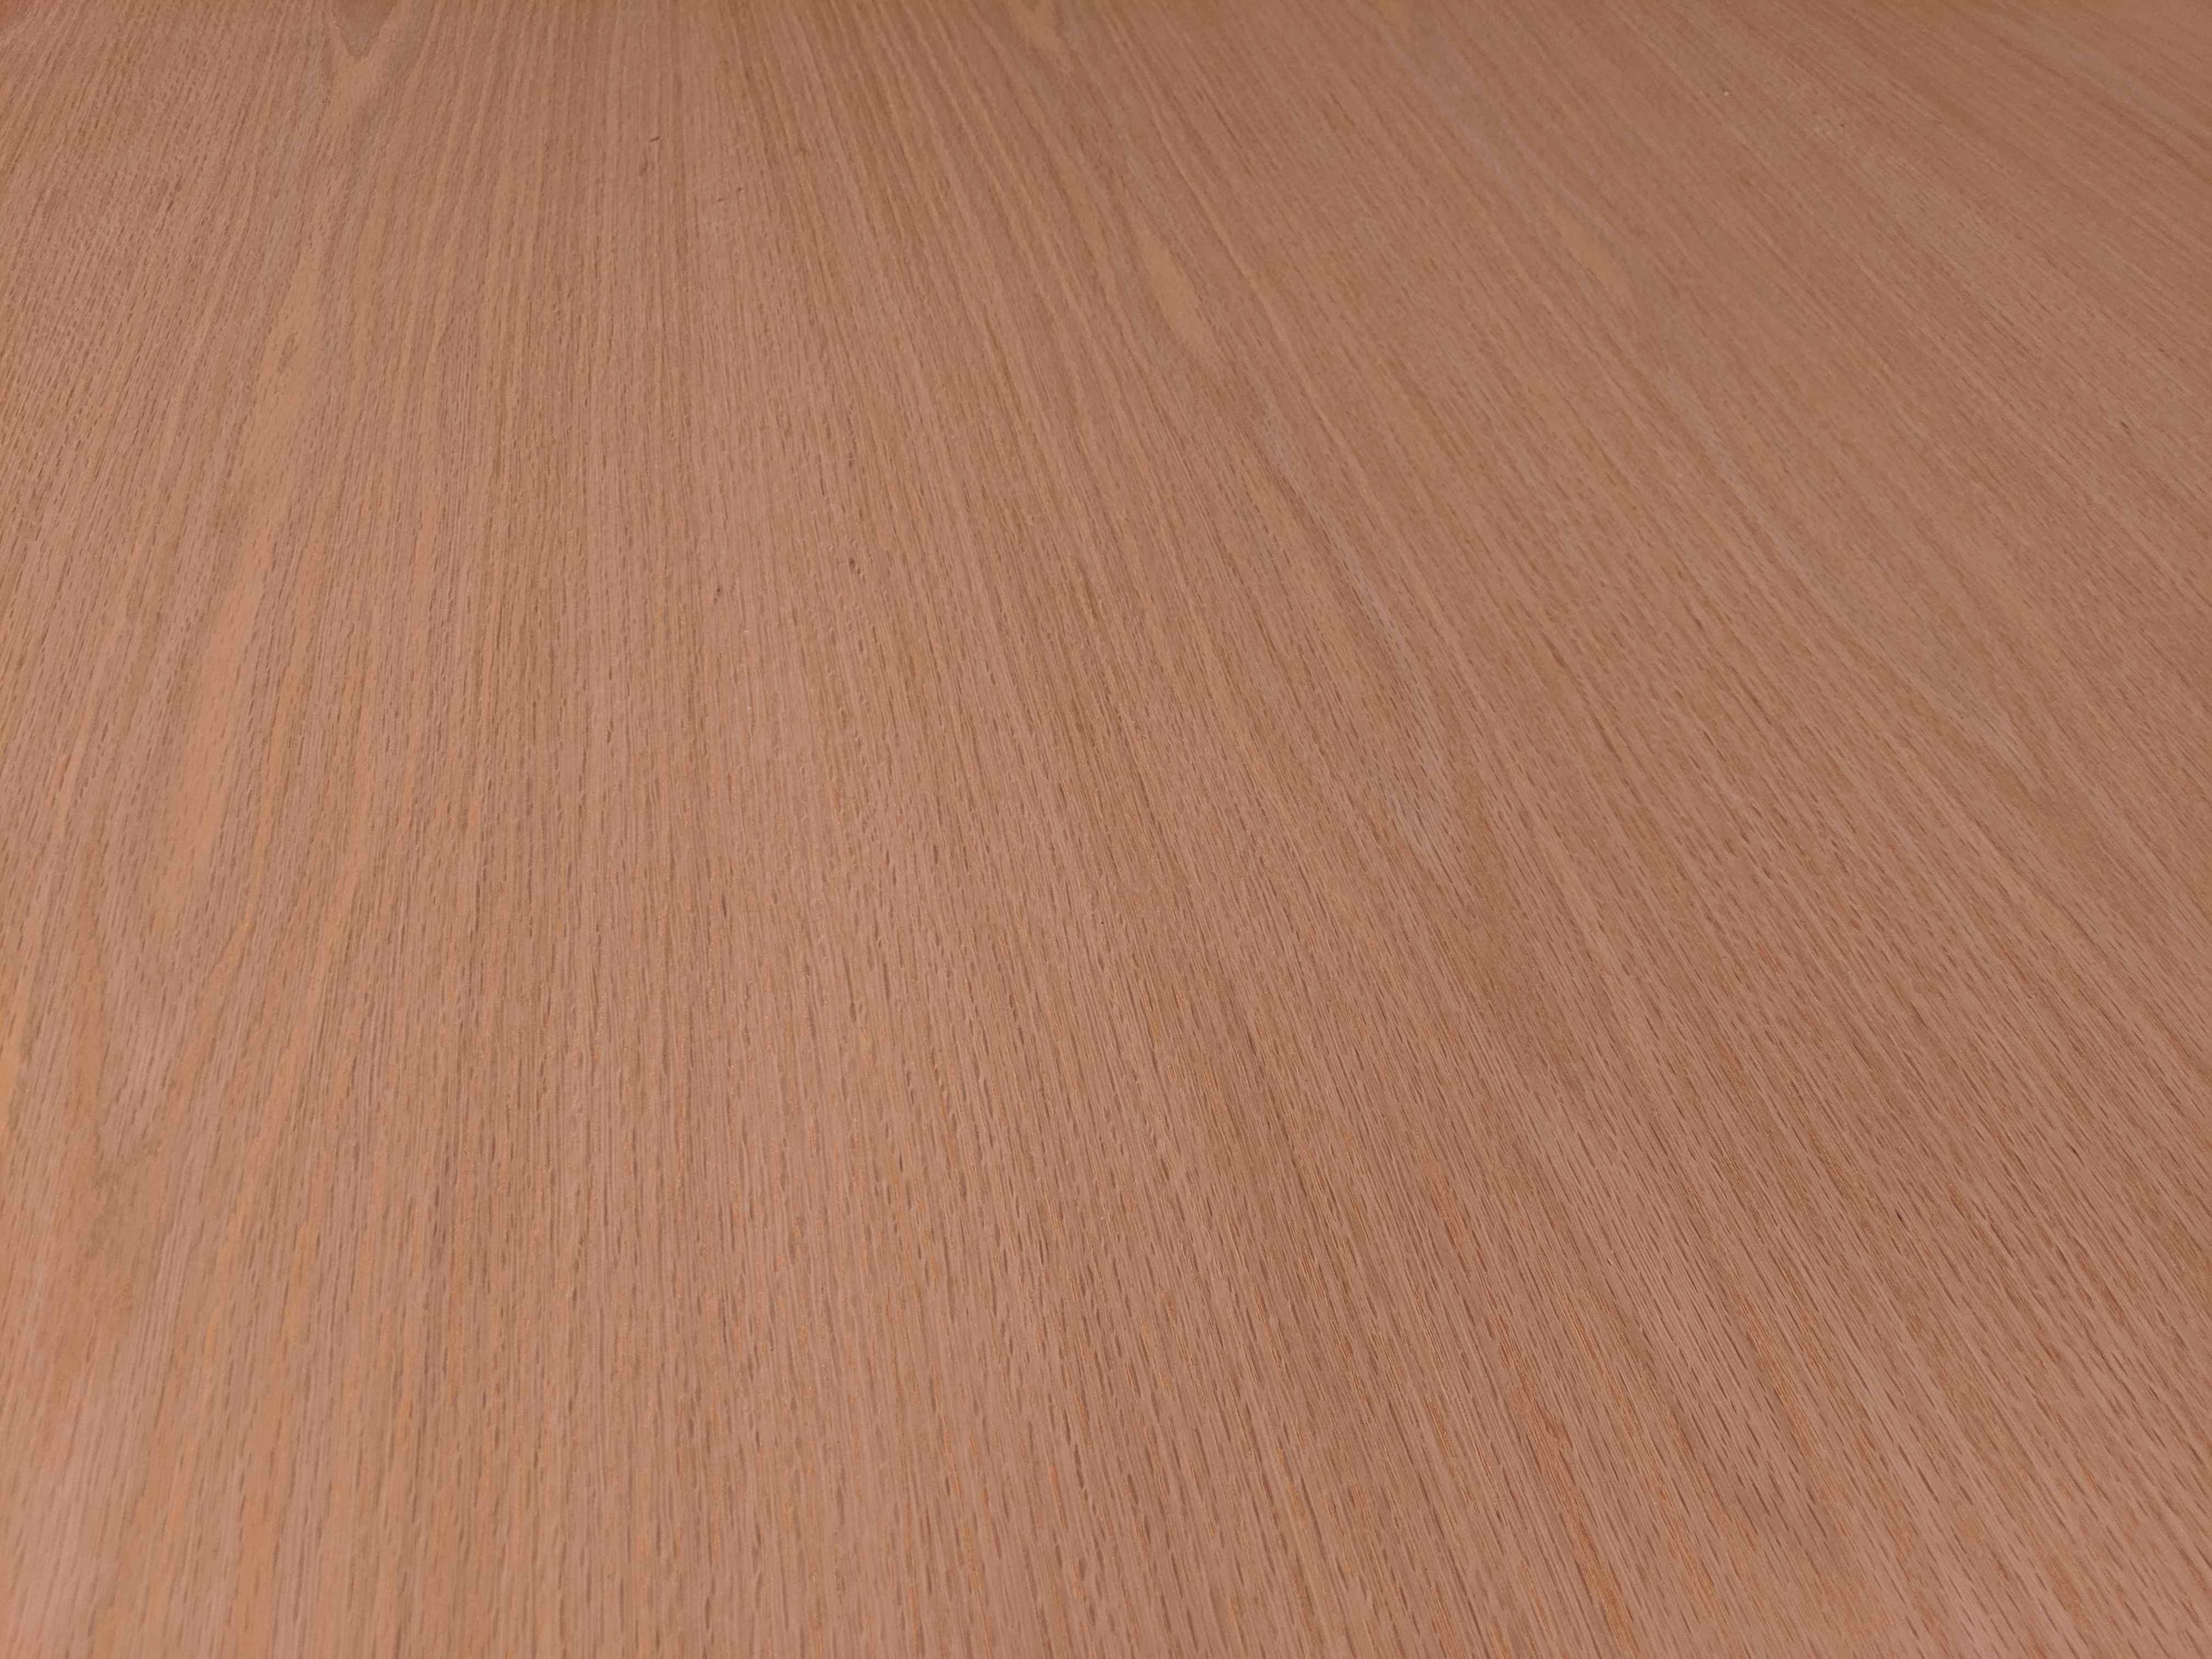 Flat Sliced Red Oak